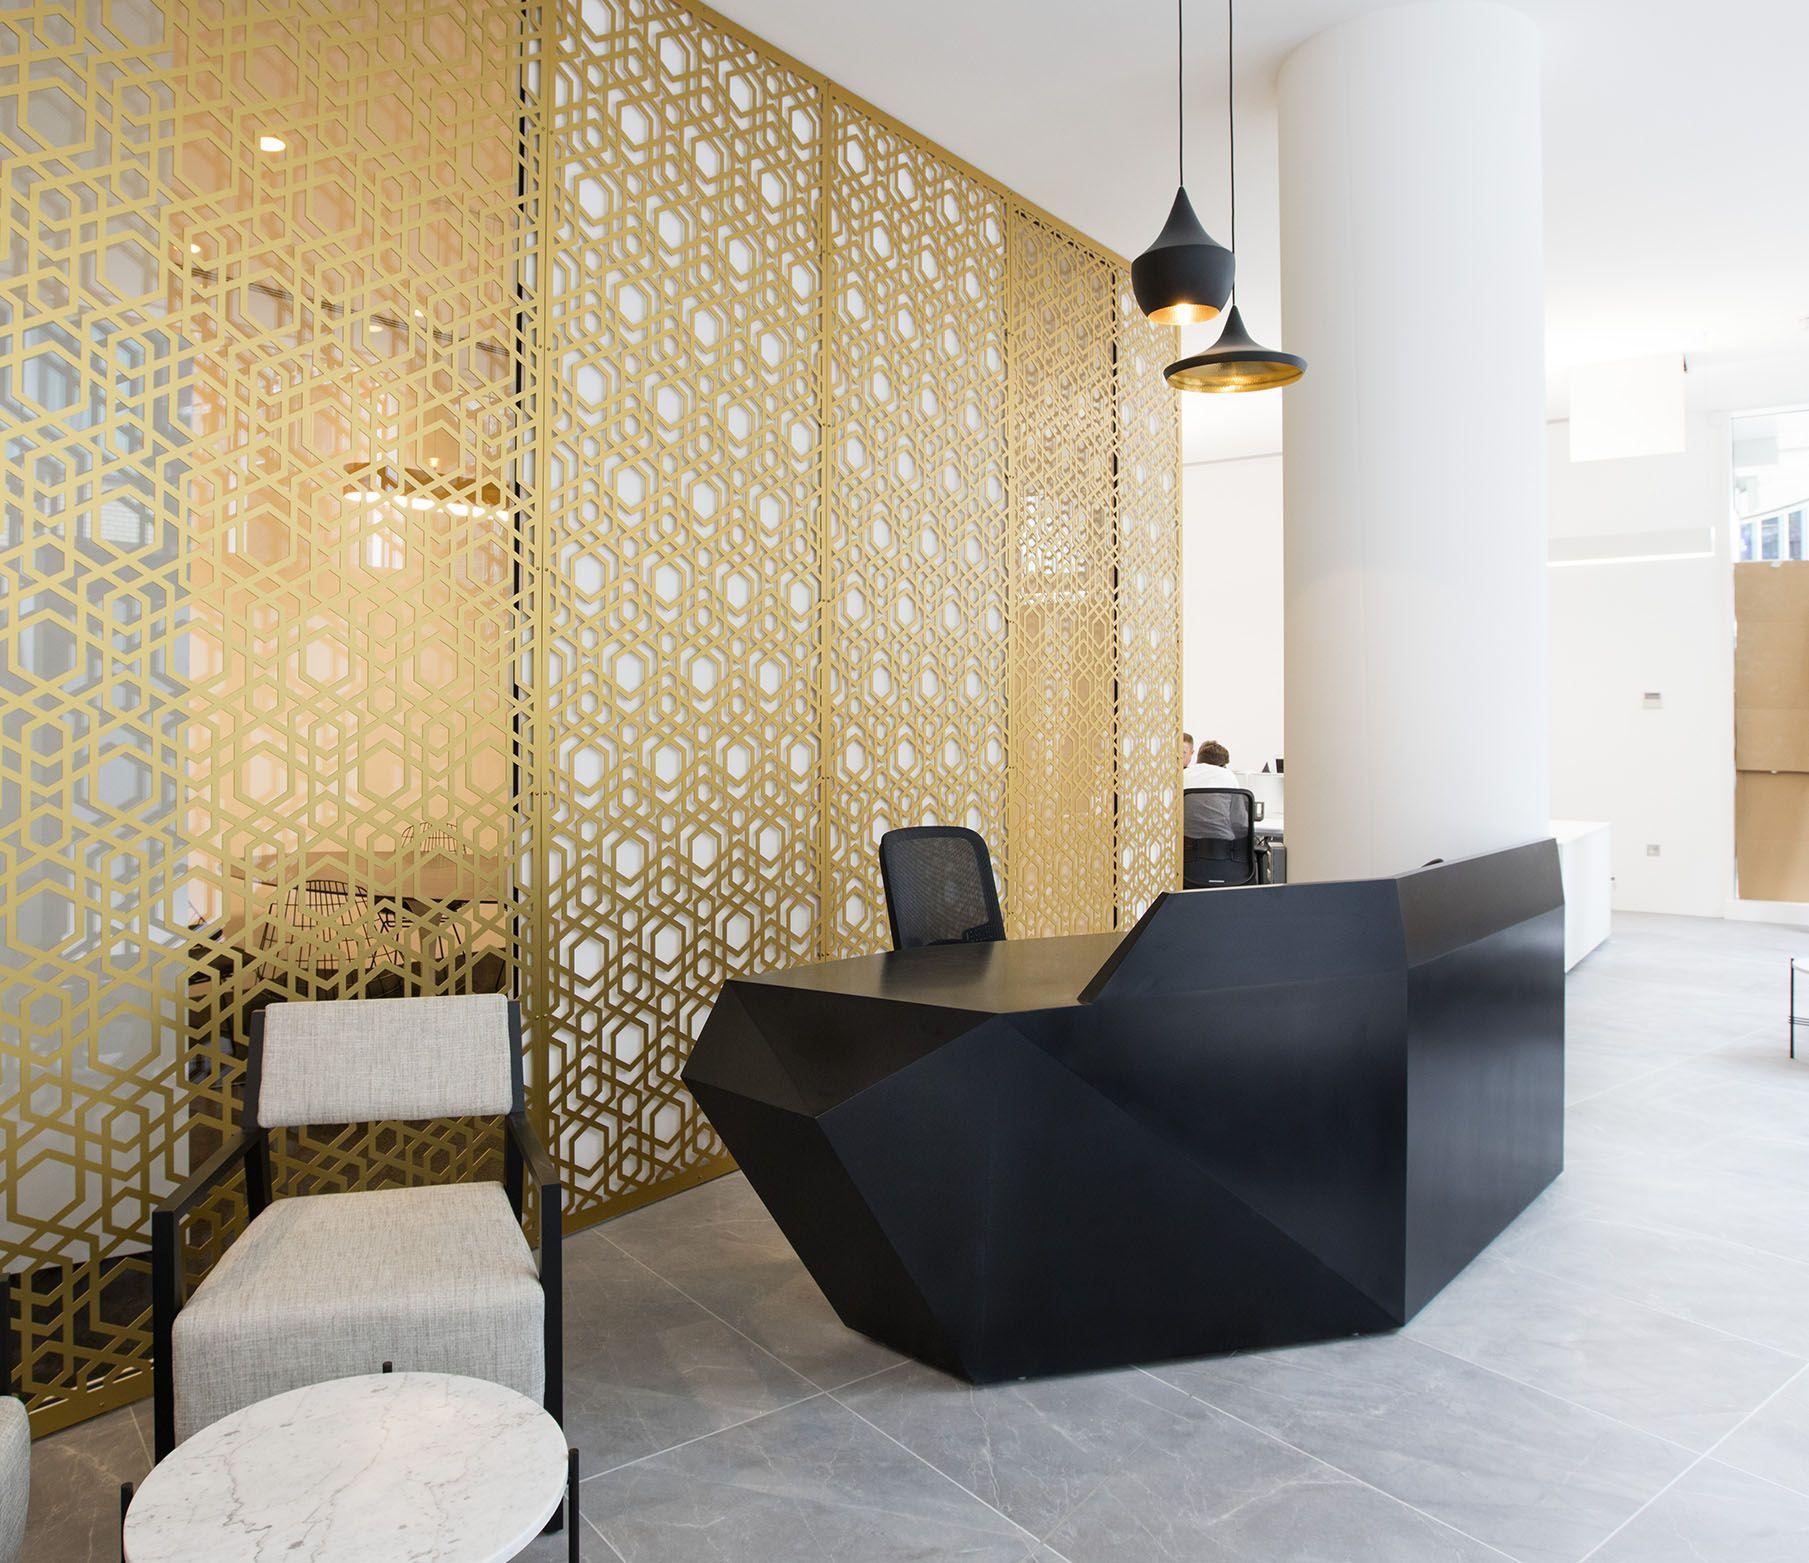 Reception Desk on Behance angular geometric cubism shapes origami faceted Pinterest